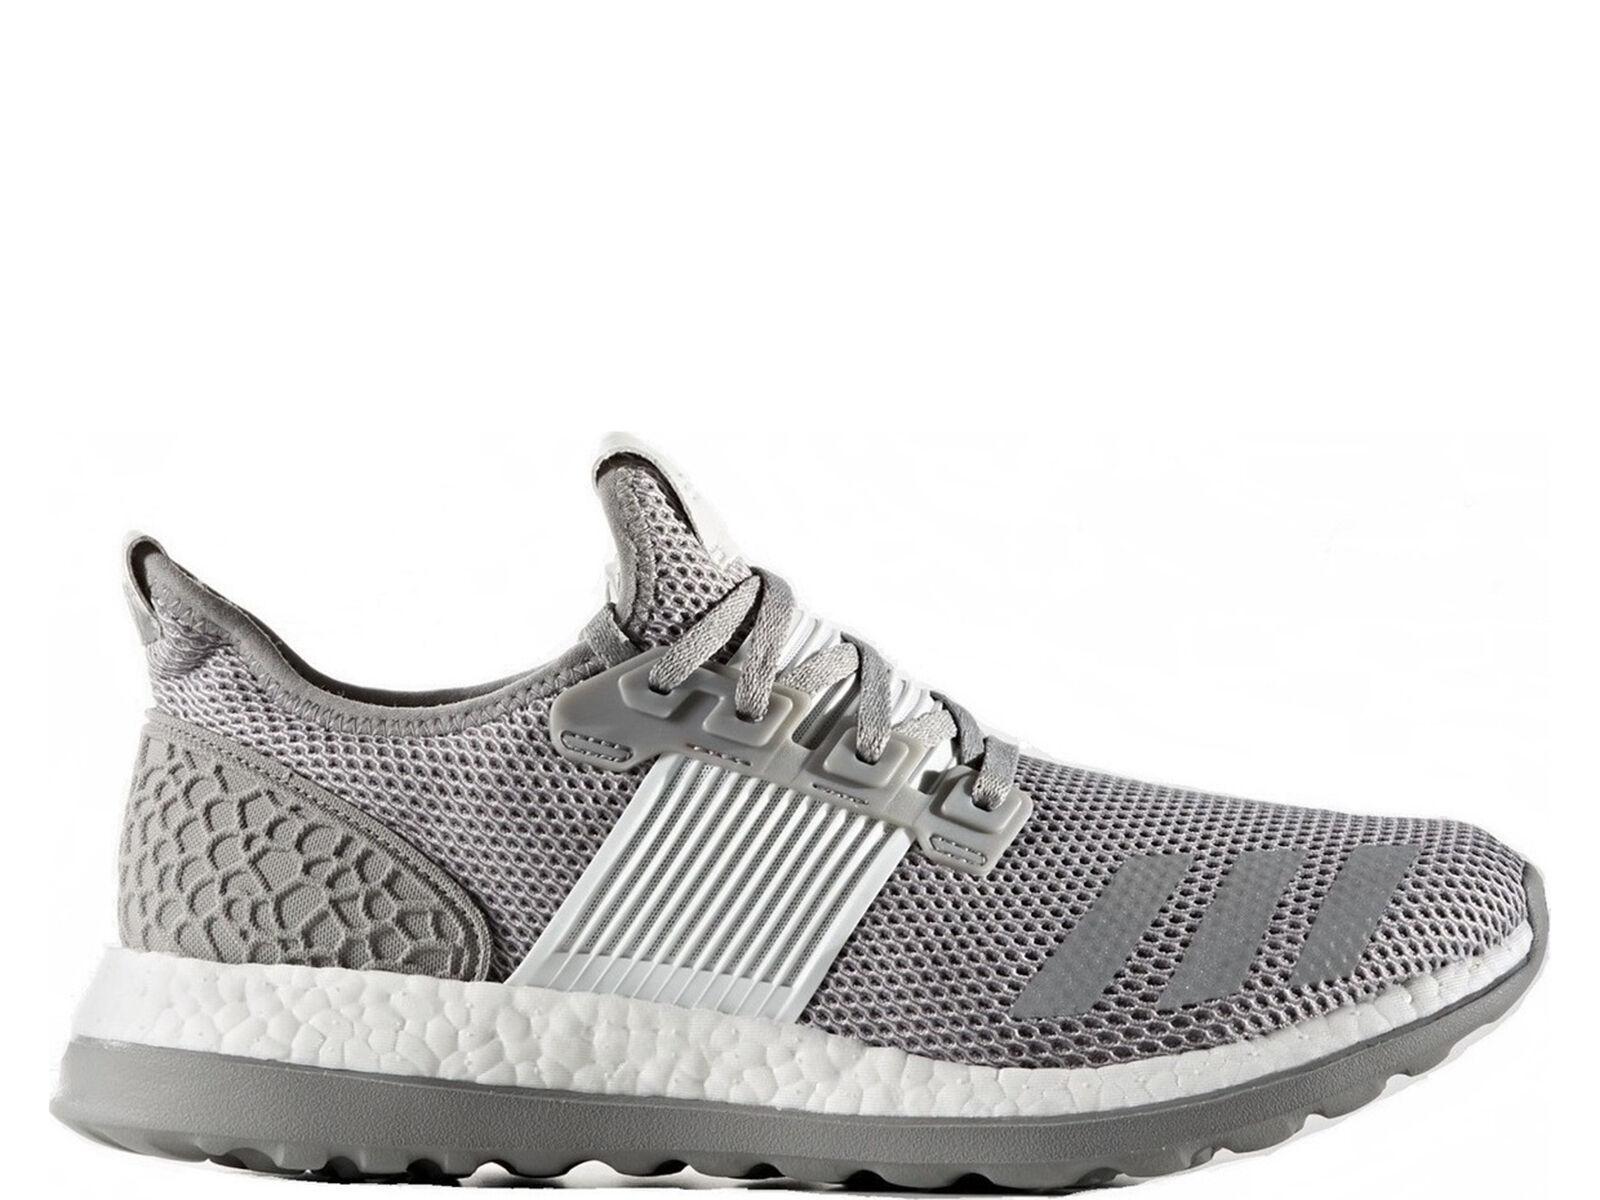 Brand New Adidas PureBOOST ZG Men's Athletic Fashion Sneakers [BB3912]